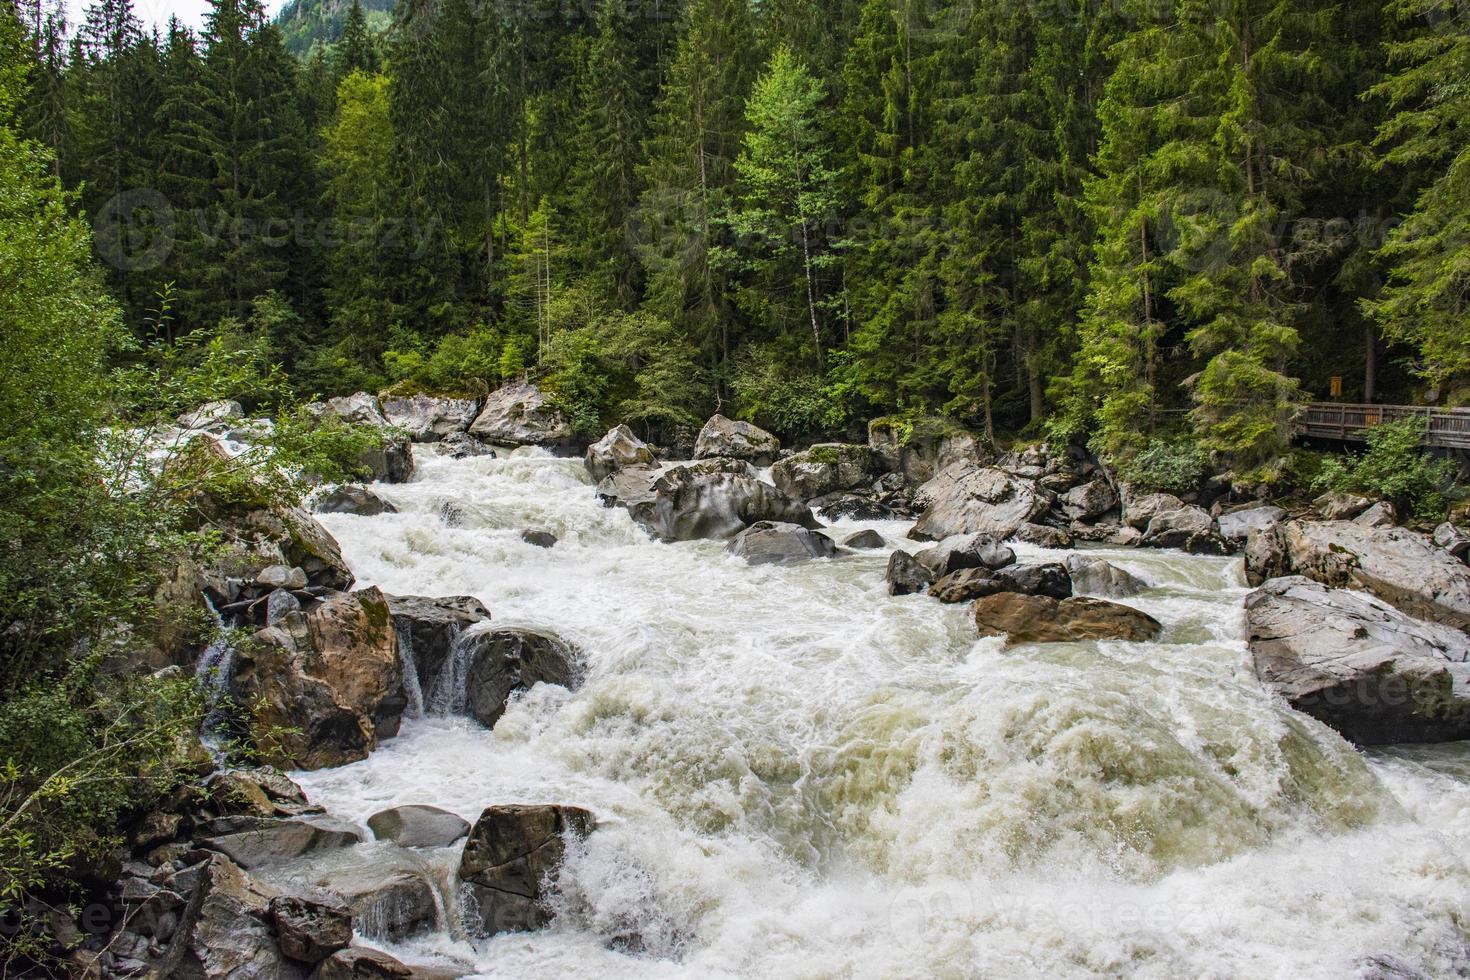 Alpine river Otztaler Ache in the Austrian Tyrol photo